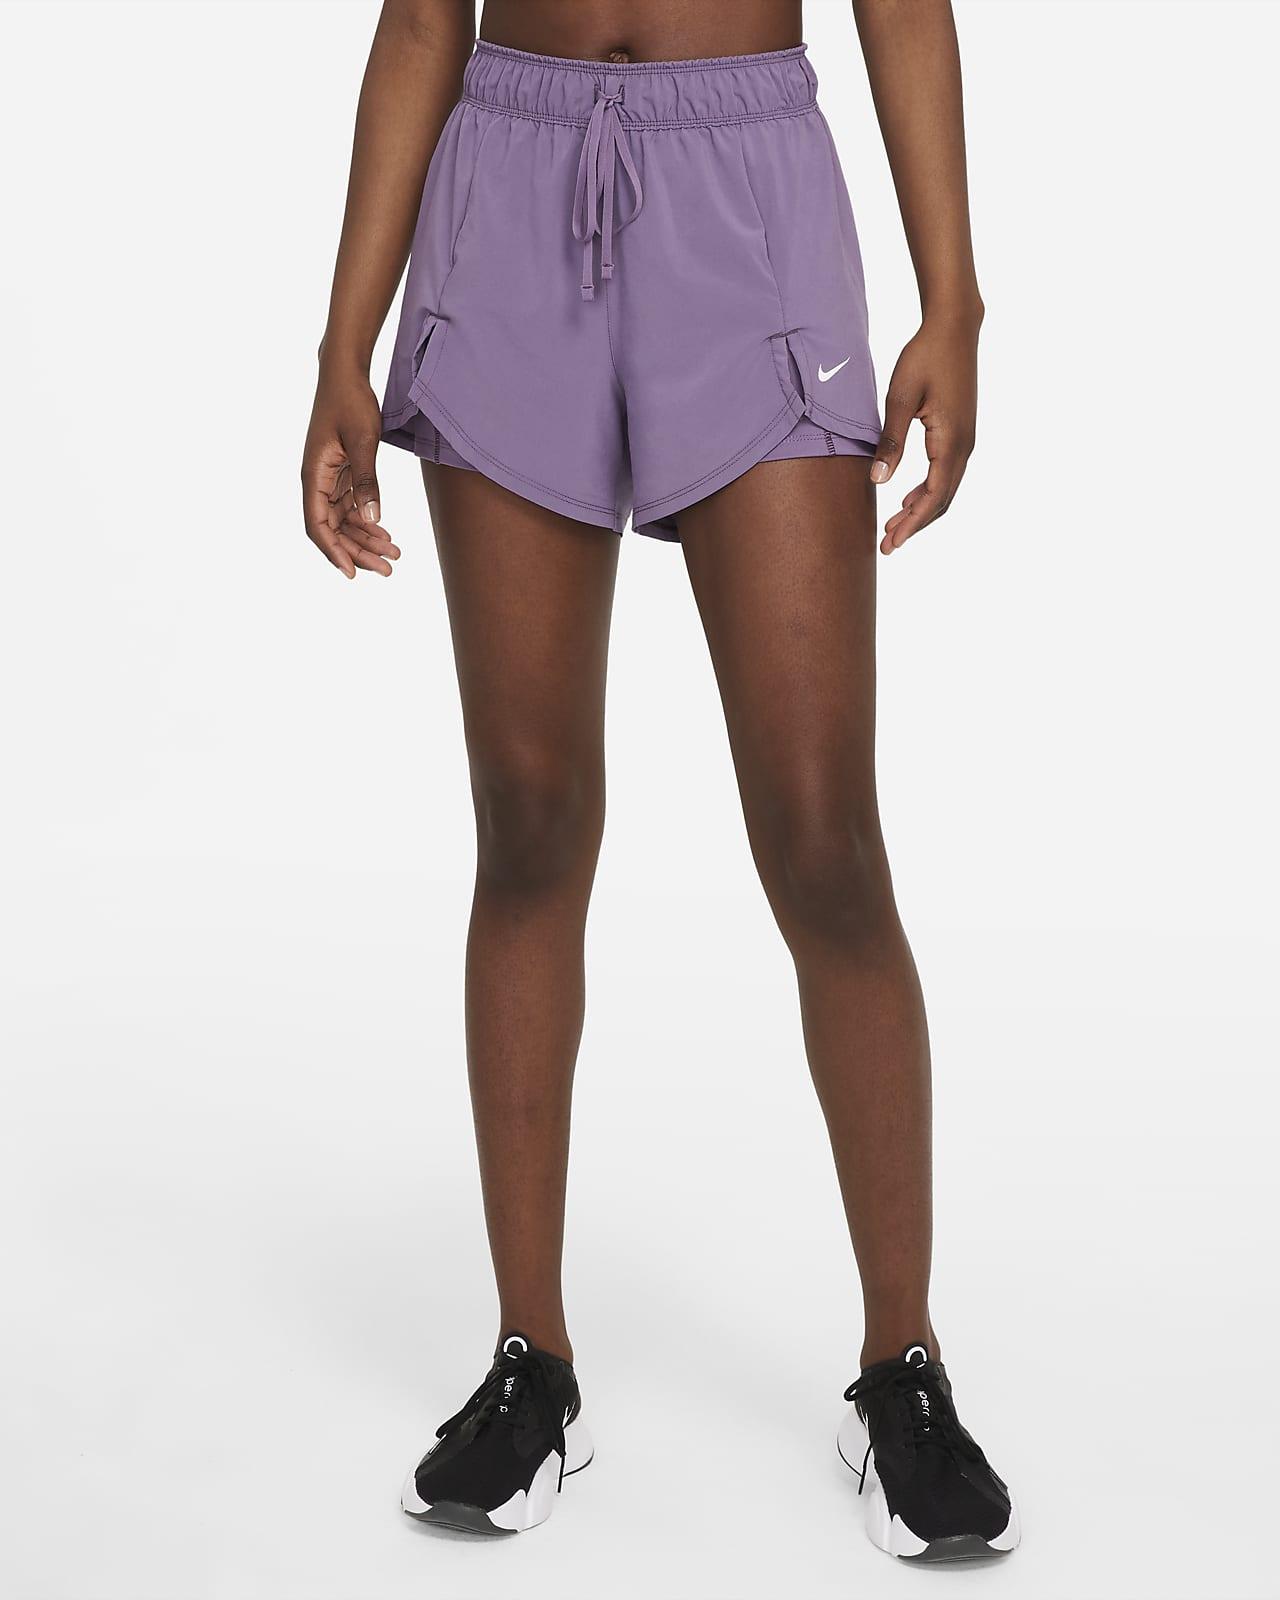 Nike Flex Essential 2-in-1 Women's Training Shorts